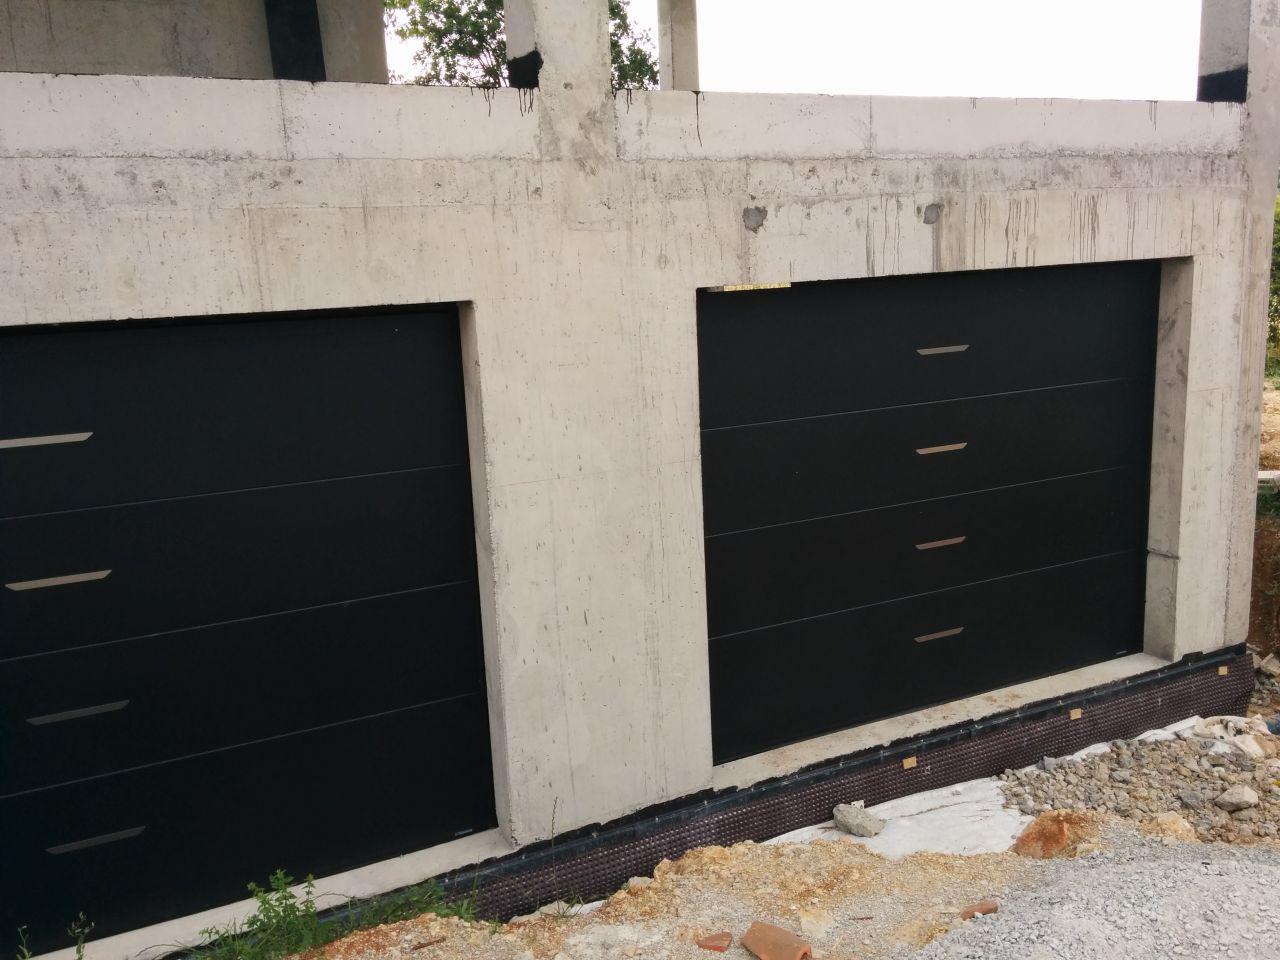 Les portes de garage installées